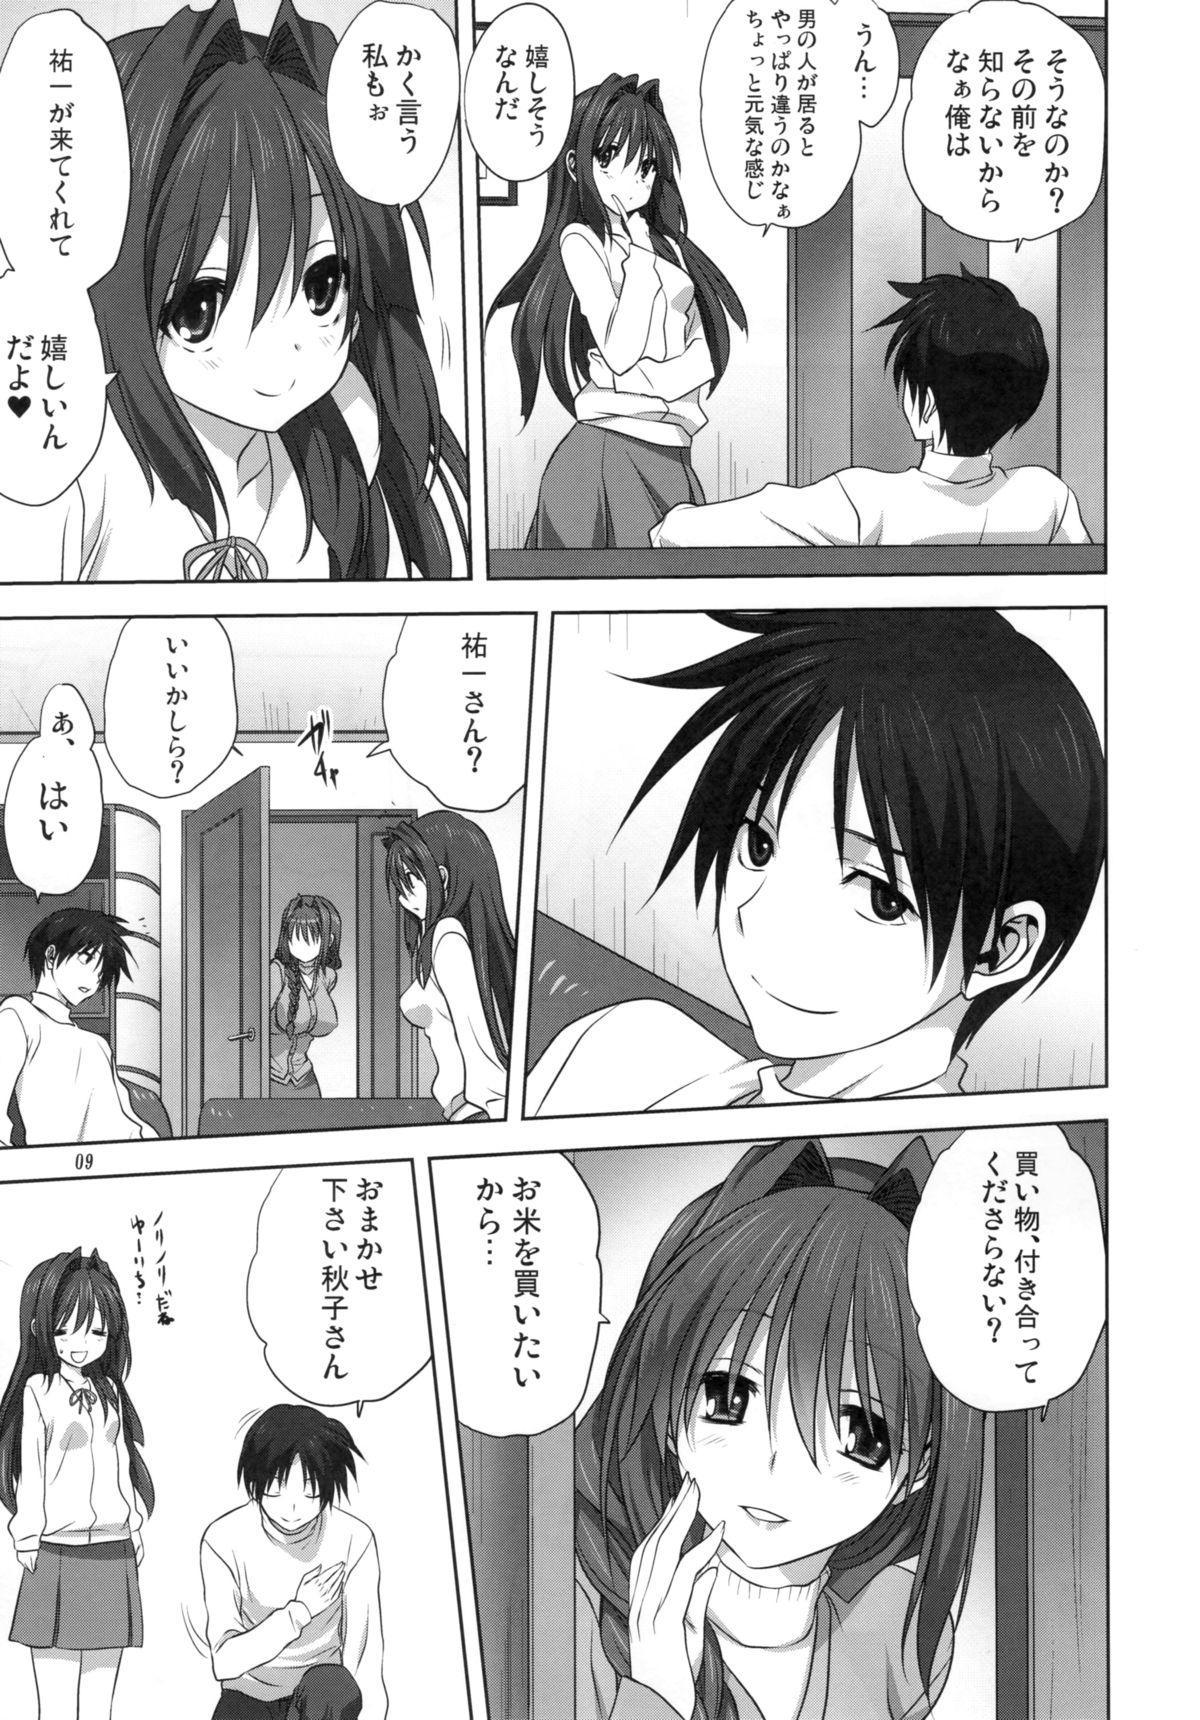 Akiko-san to Issho 16 7